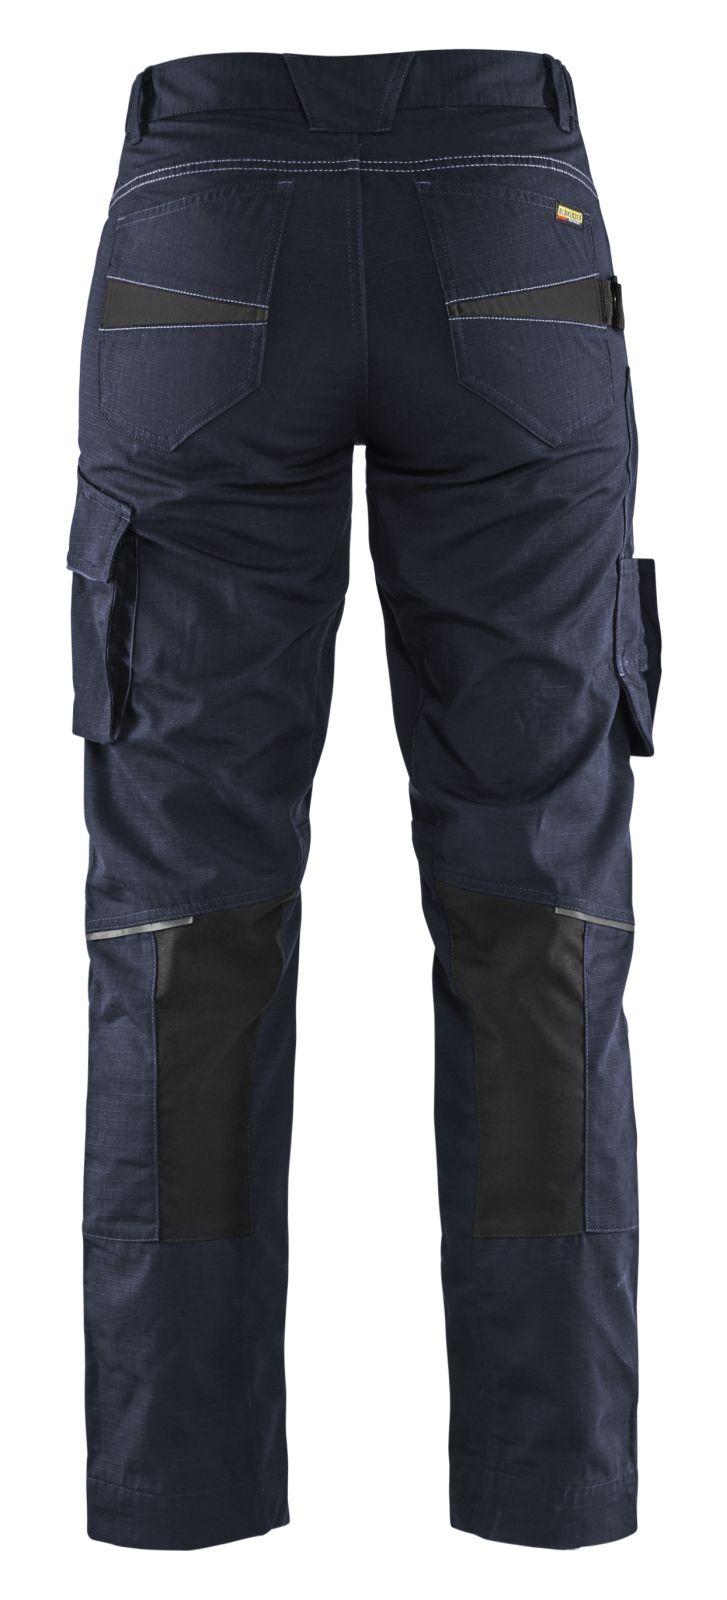 Blaklader Broeken 71951330 donker marineblauw-zwart(8699)